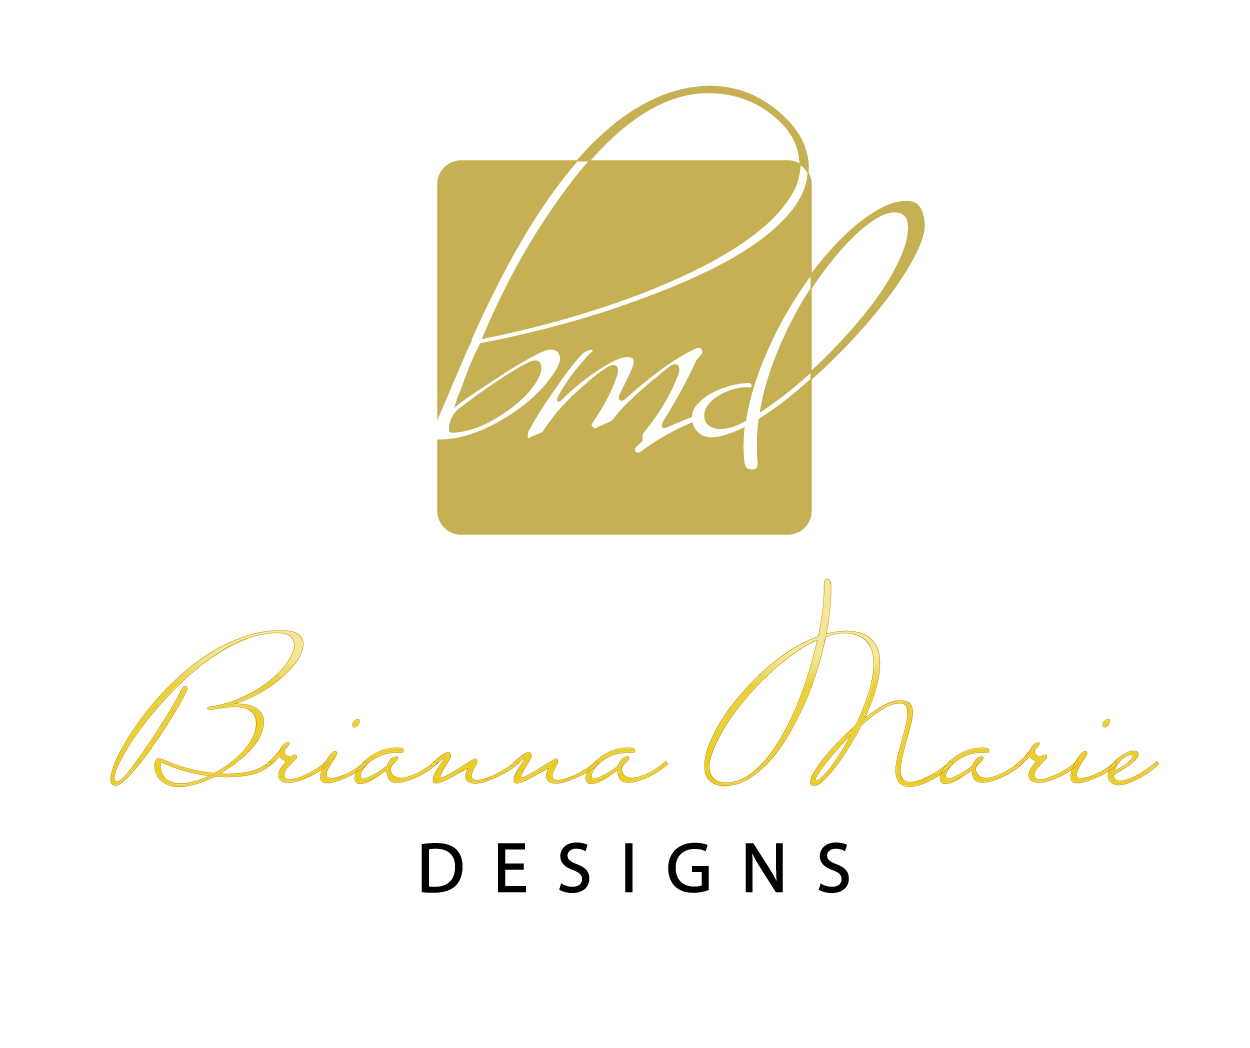 Brianna Warren